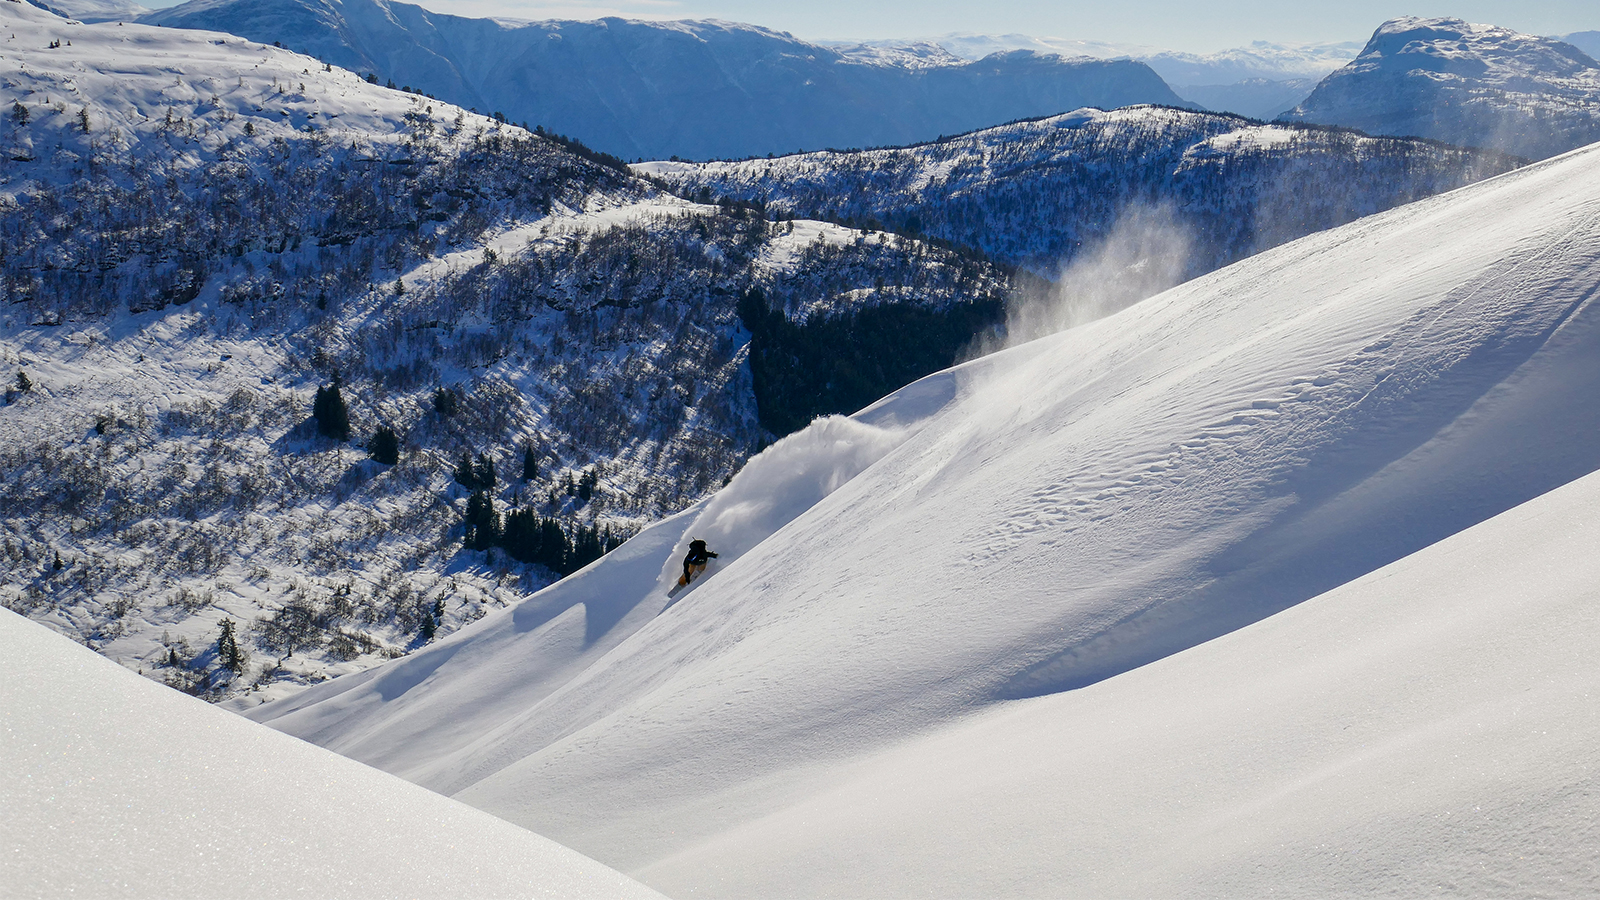 Furberg-Snowboards-Photo-Terje-Valen-Hølhjelle-1